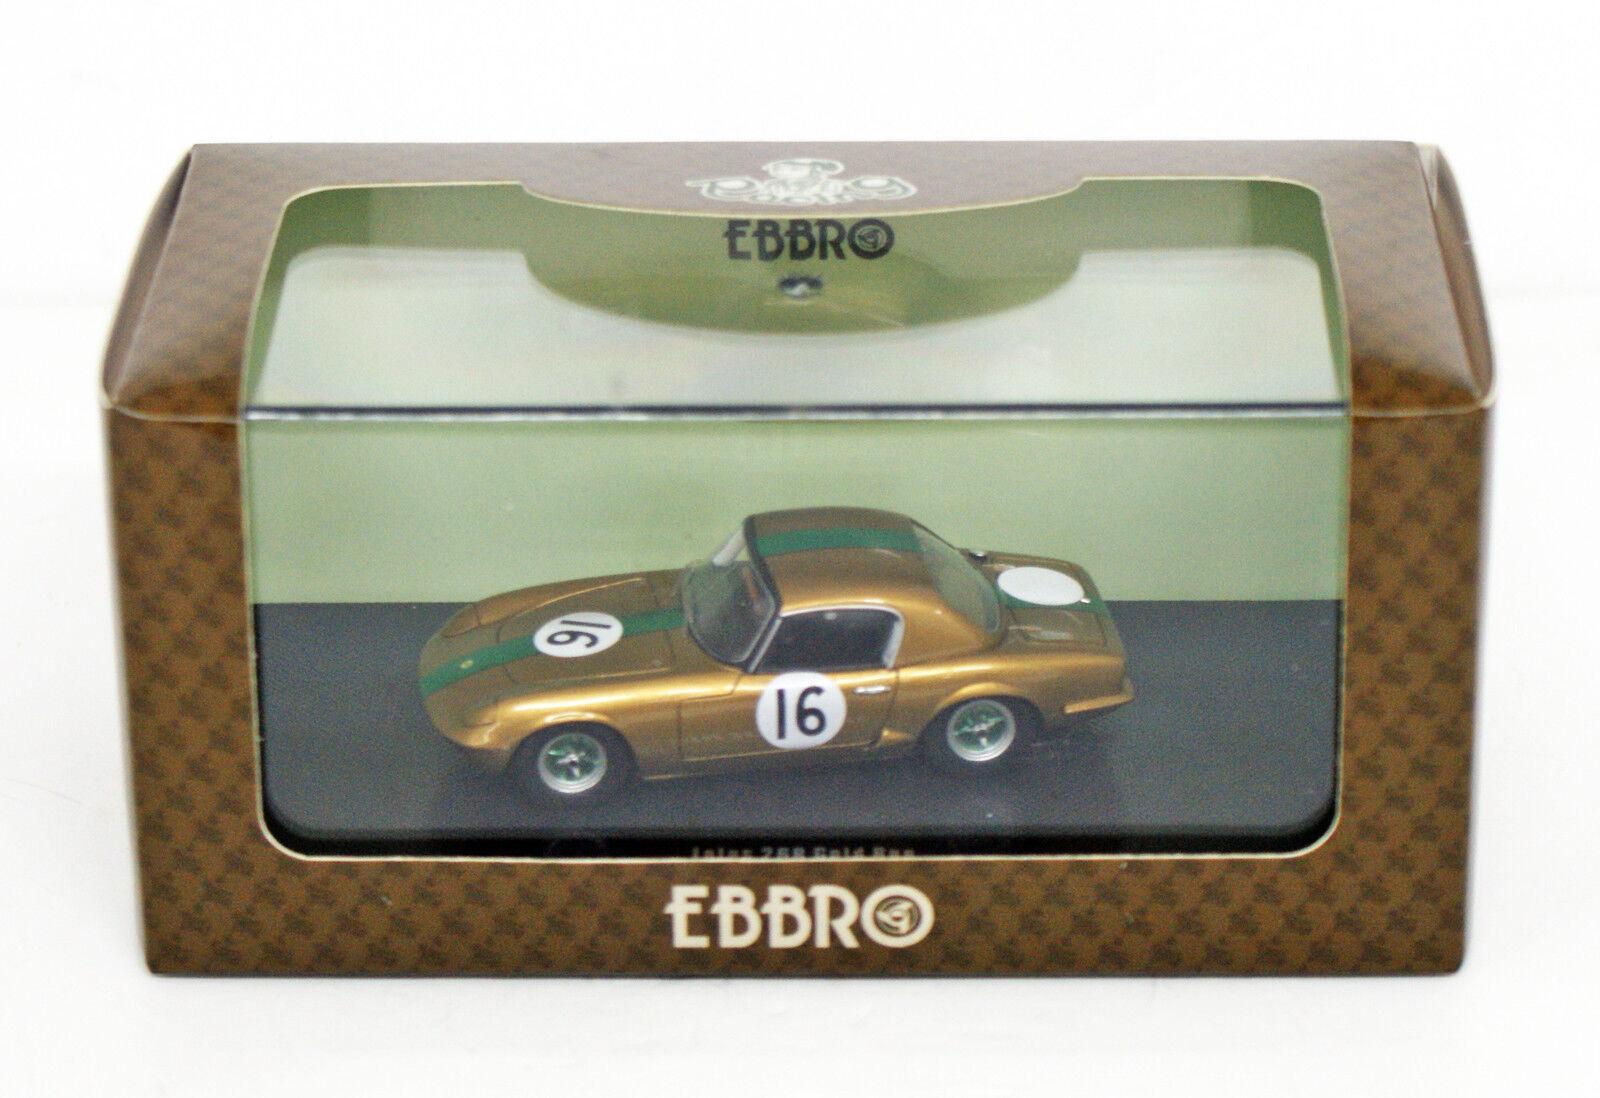 compra en línea hoy Ebbro 44661 44661 44661 Lotus 26r No. 16 EsCocheabajo De oro (Modelo de resina) 1 43 Escala  60% de descuento